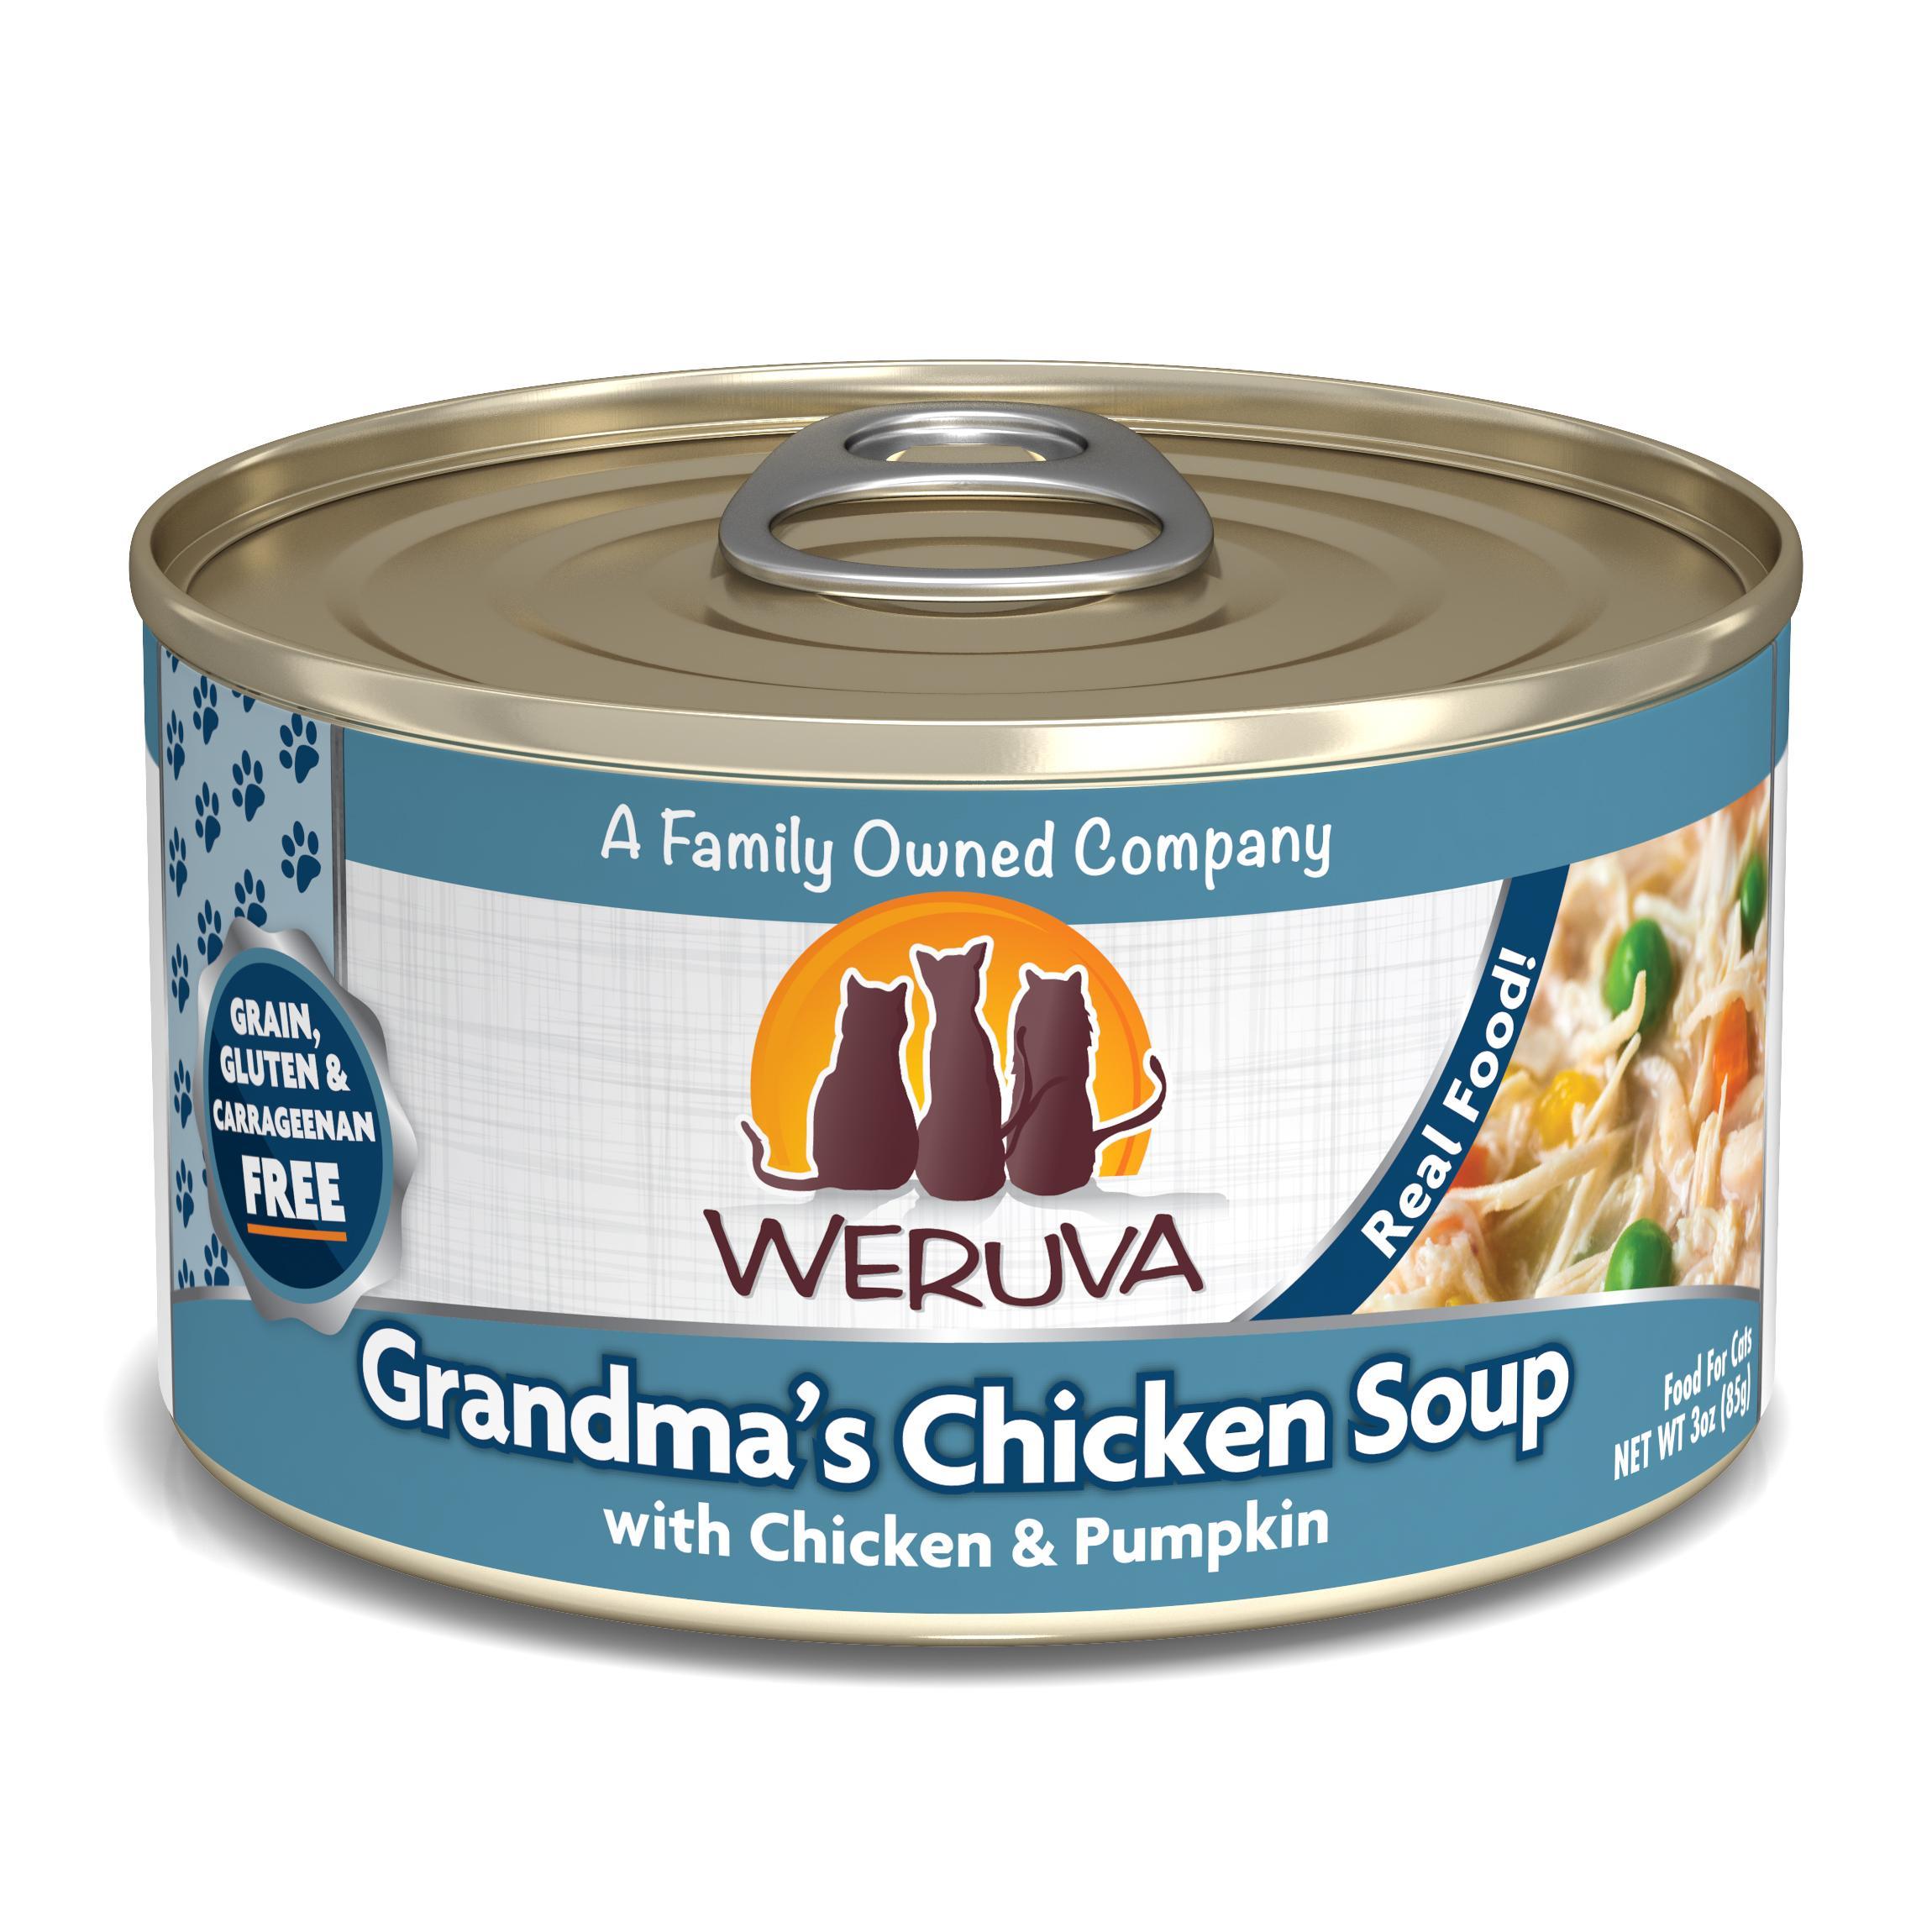 Weruva Cat Classic Grandma's Chicken Soup with Chicken & Pumpkin Grain-Free Wet Cat Food Image